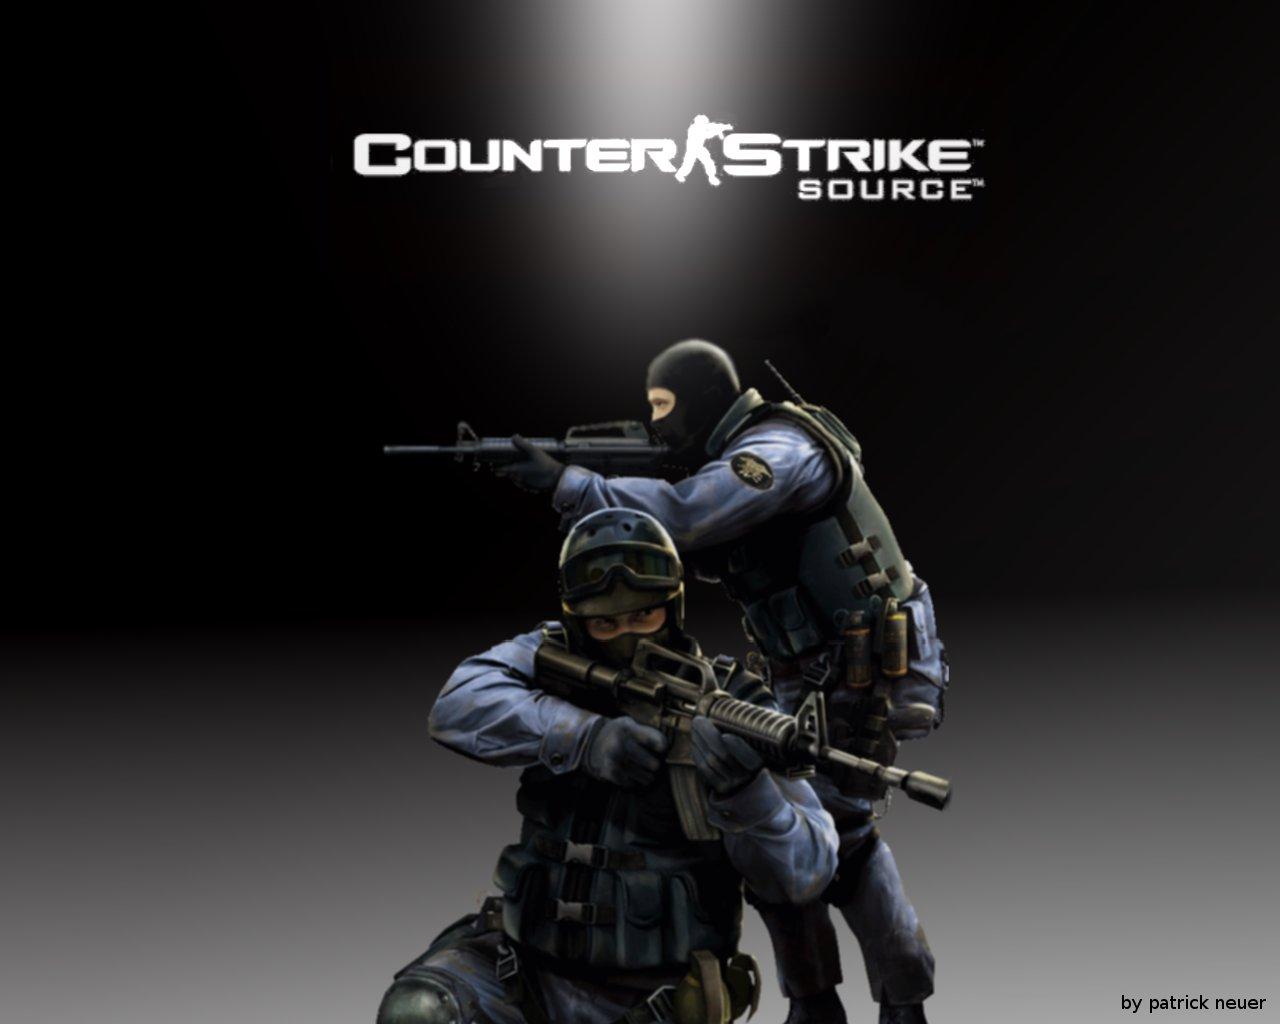 counter strike source лого: